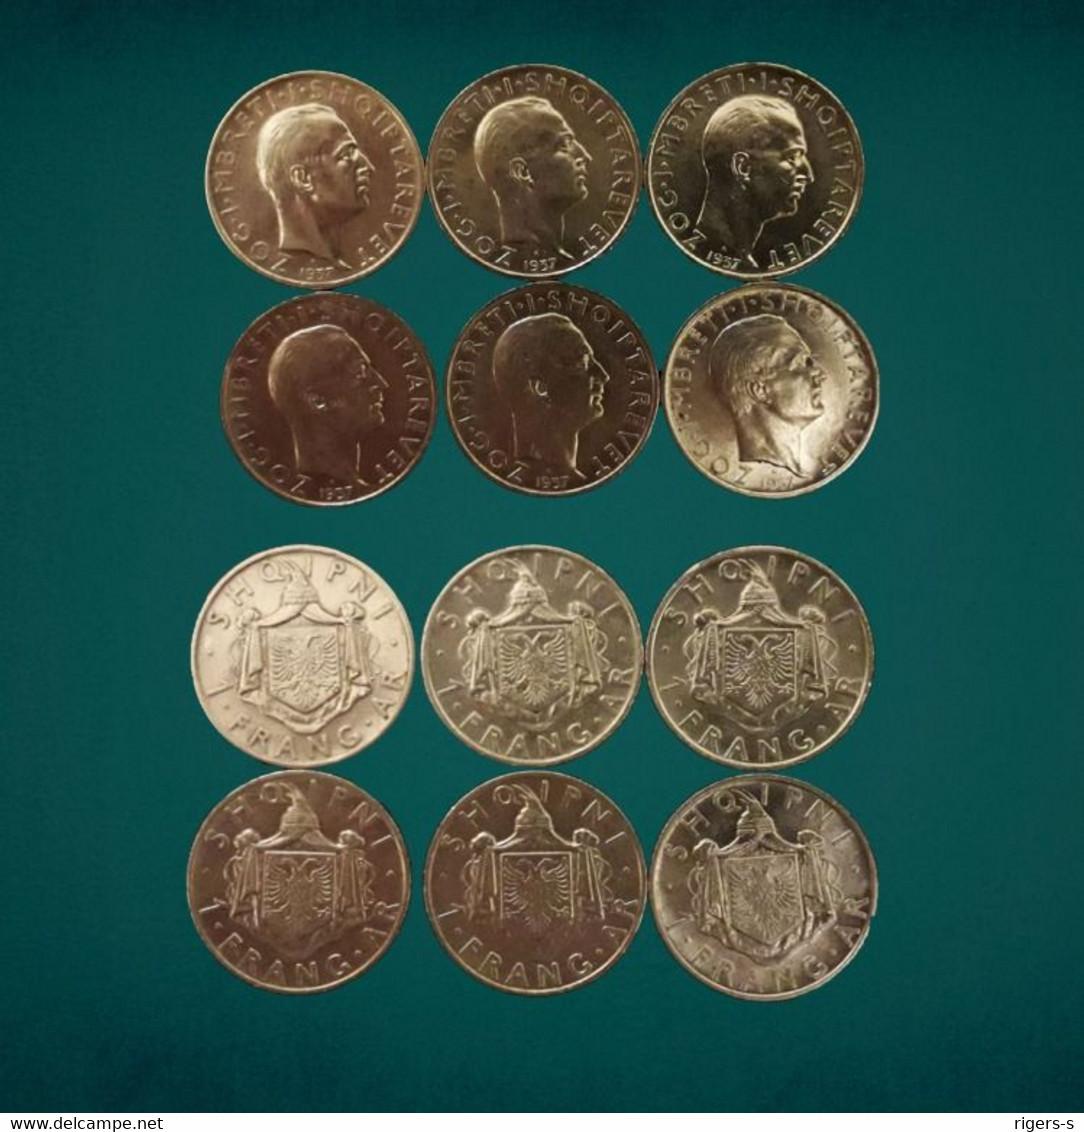 Albania 1 Frang Ar 1937 KING ZOG I - XF-AUNC Condition KM#16 Lower Mintage Than Year 1935  (1 Piece) - Albania